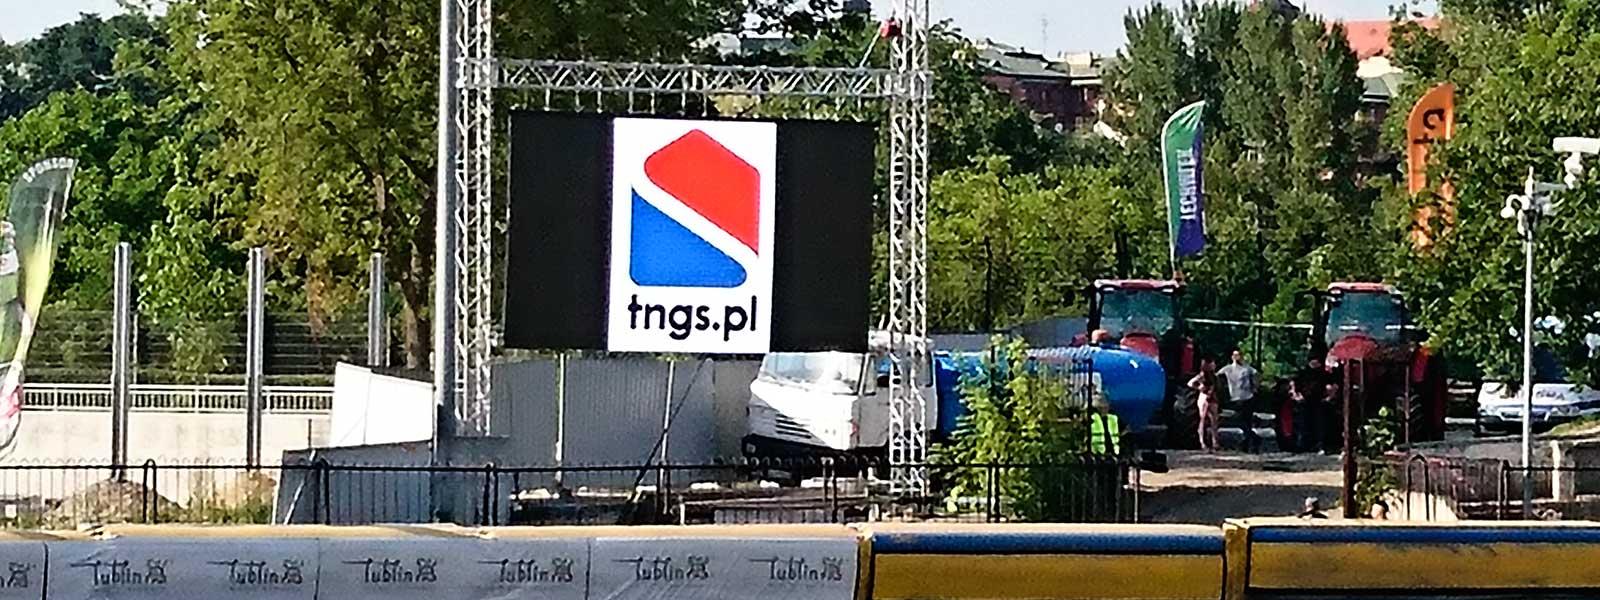 Tngs.pl i Speed Car Motor Lublin - TNGS Tomasz Karman - Biuro Obsługi Inwestora - Lublin